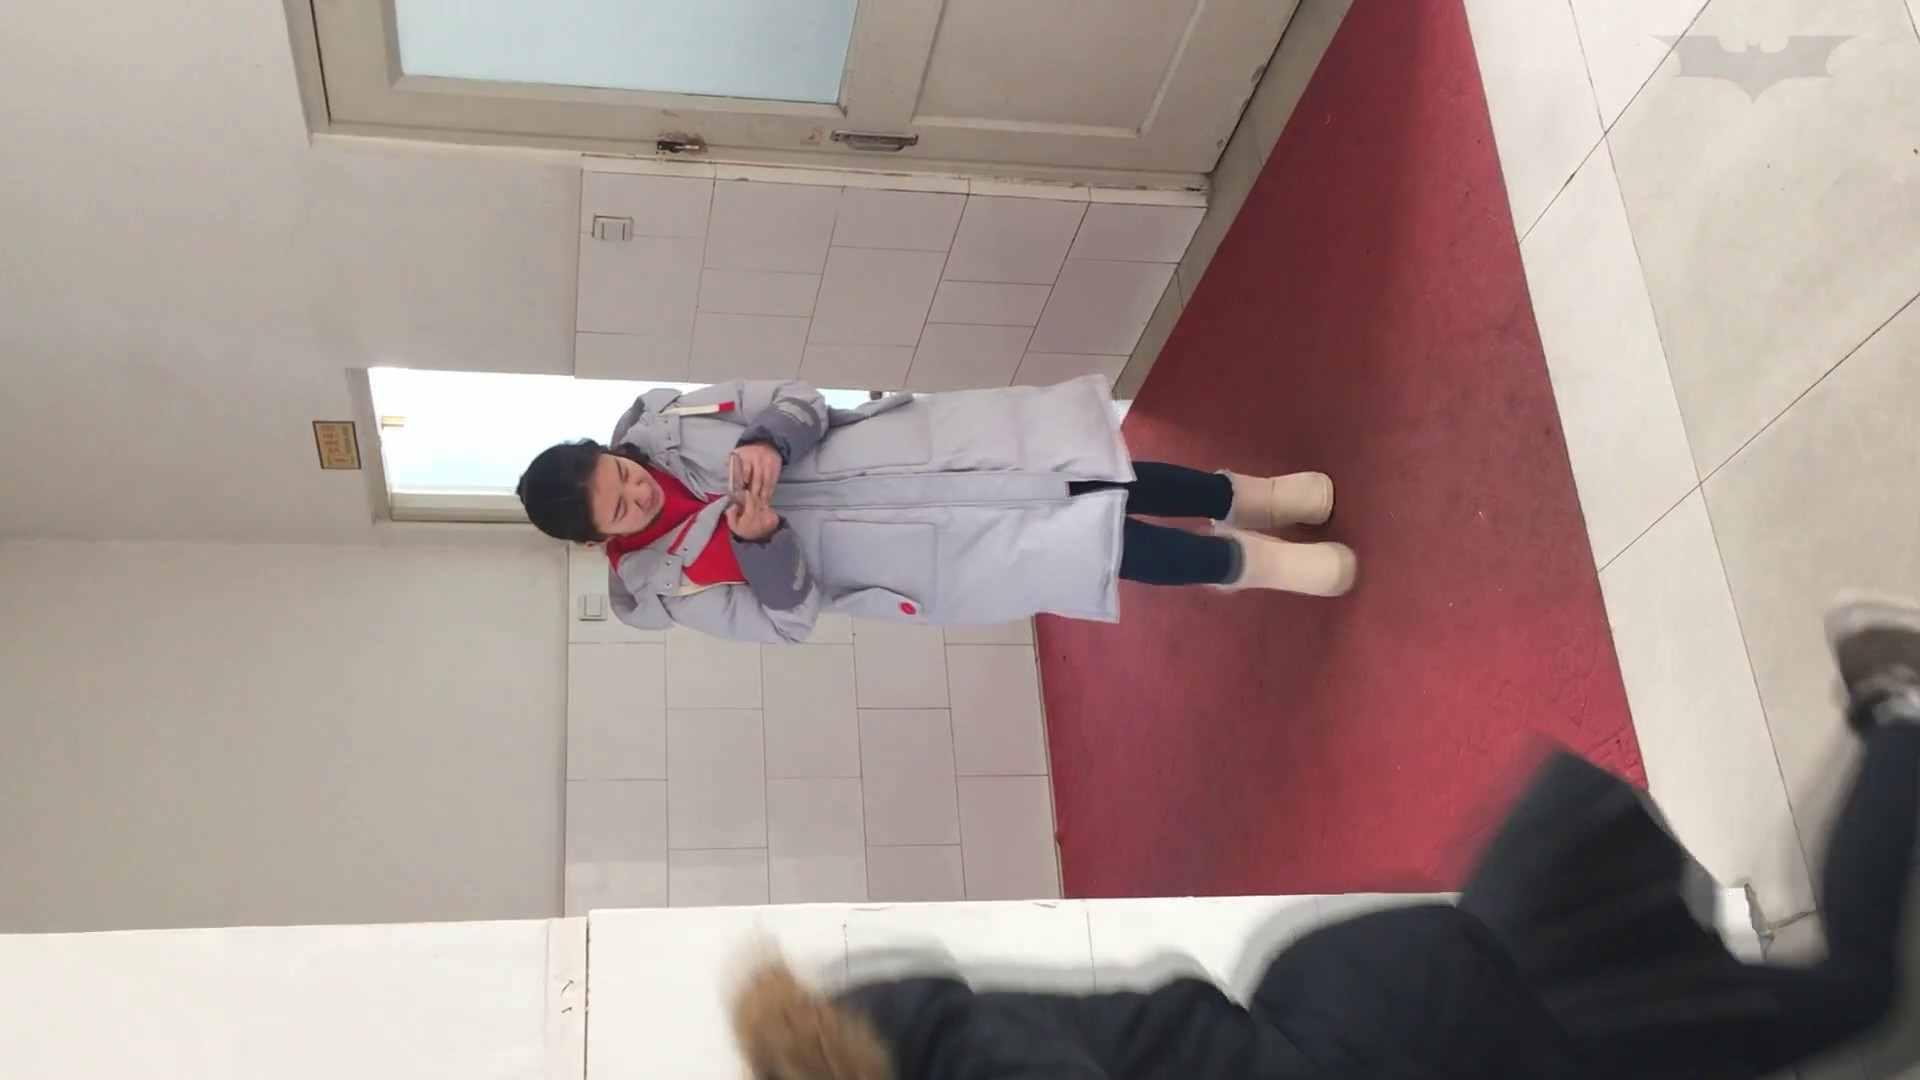 芸術大学ガチ潜入盗撮 JD盗撮 美女の洗面所の秘密 Vol.91 高画質動画 ヌード画像 66画像 61